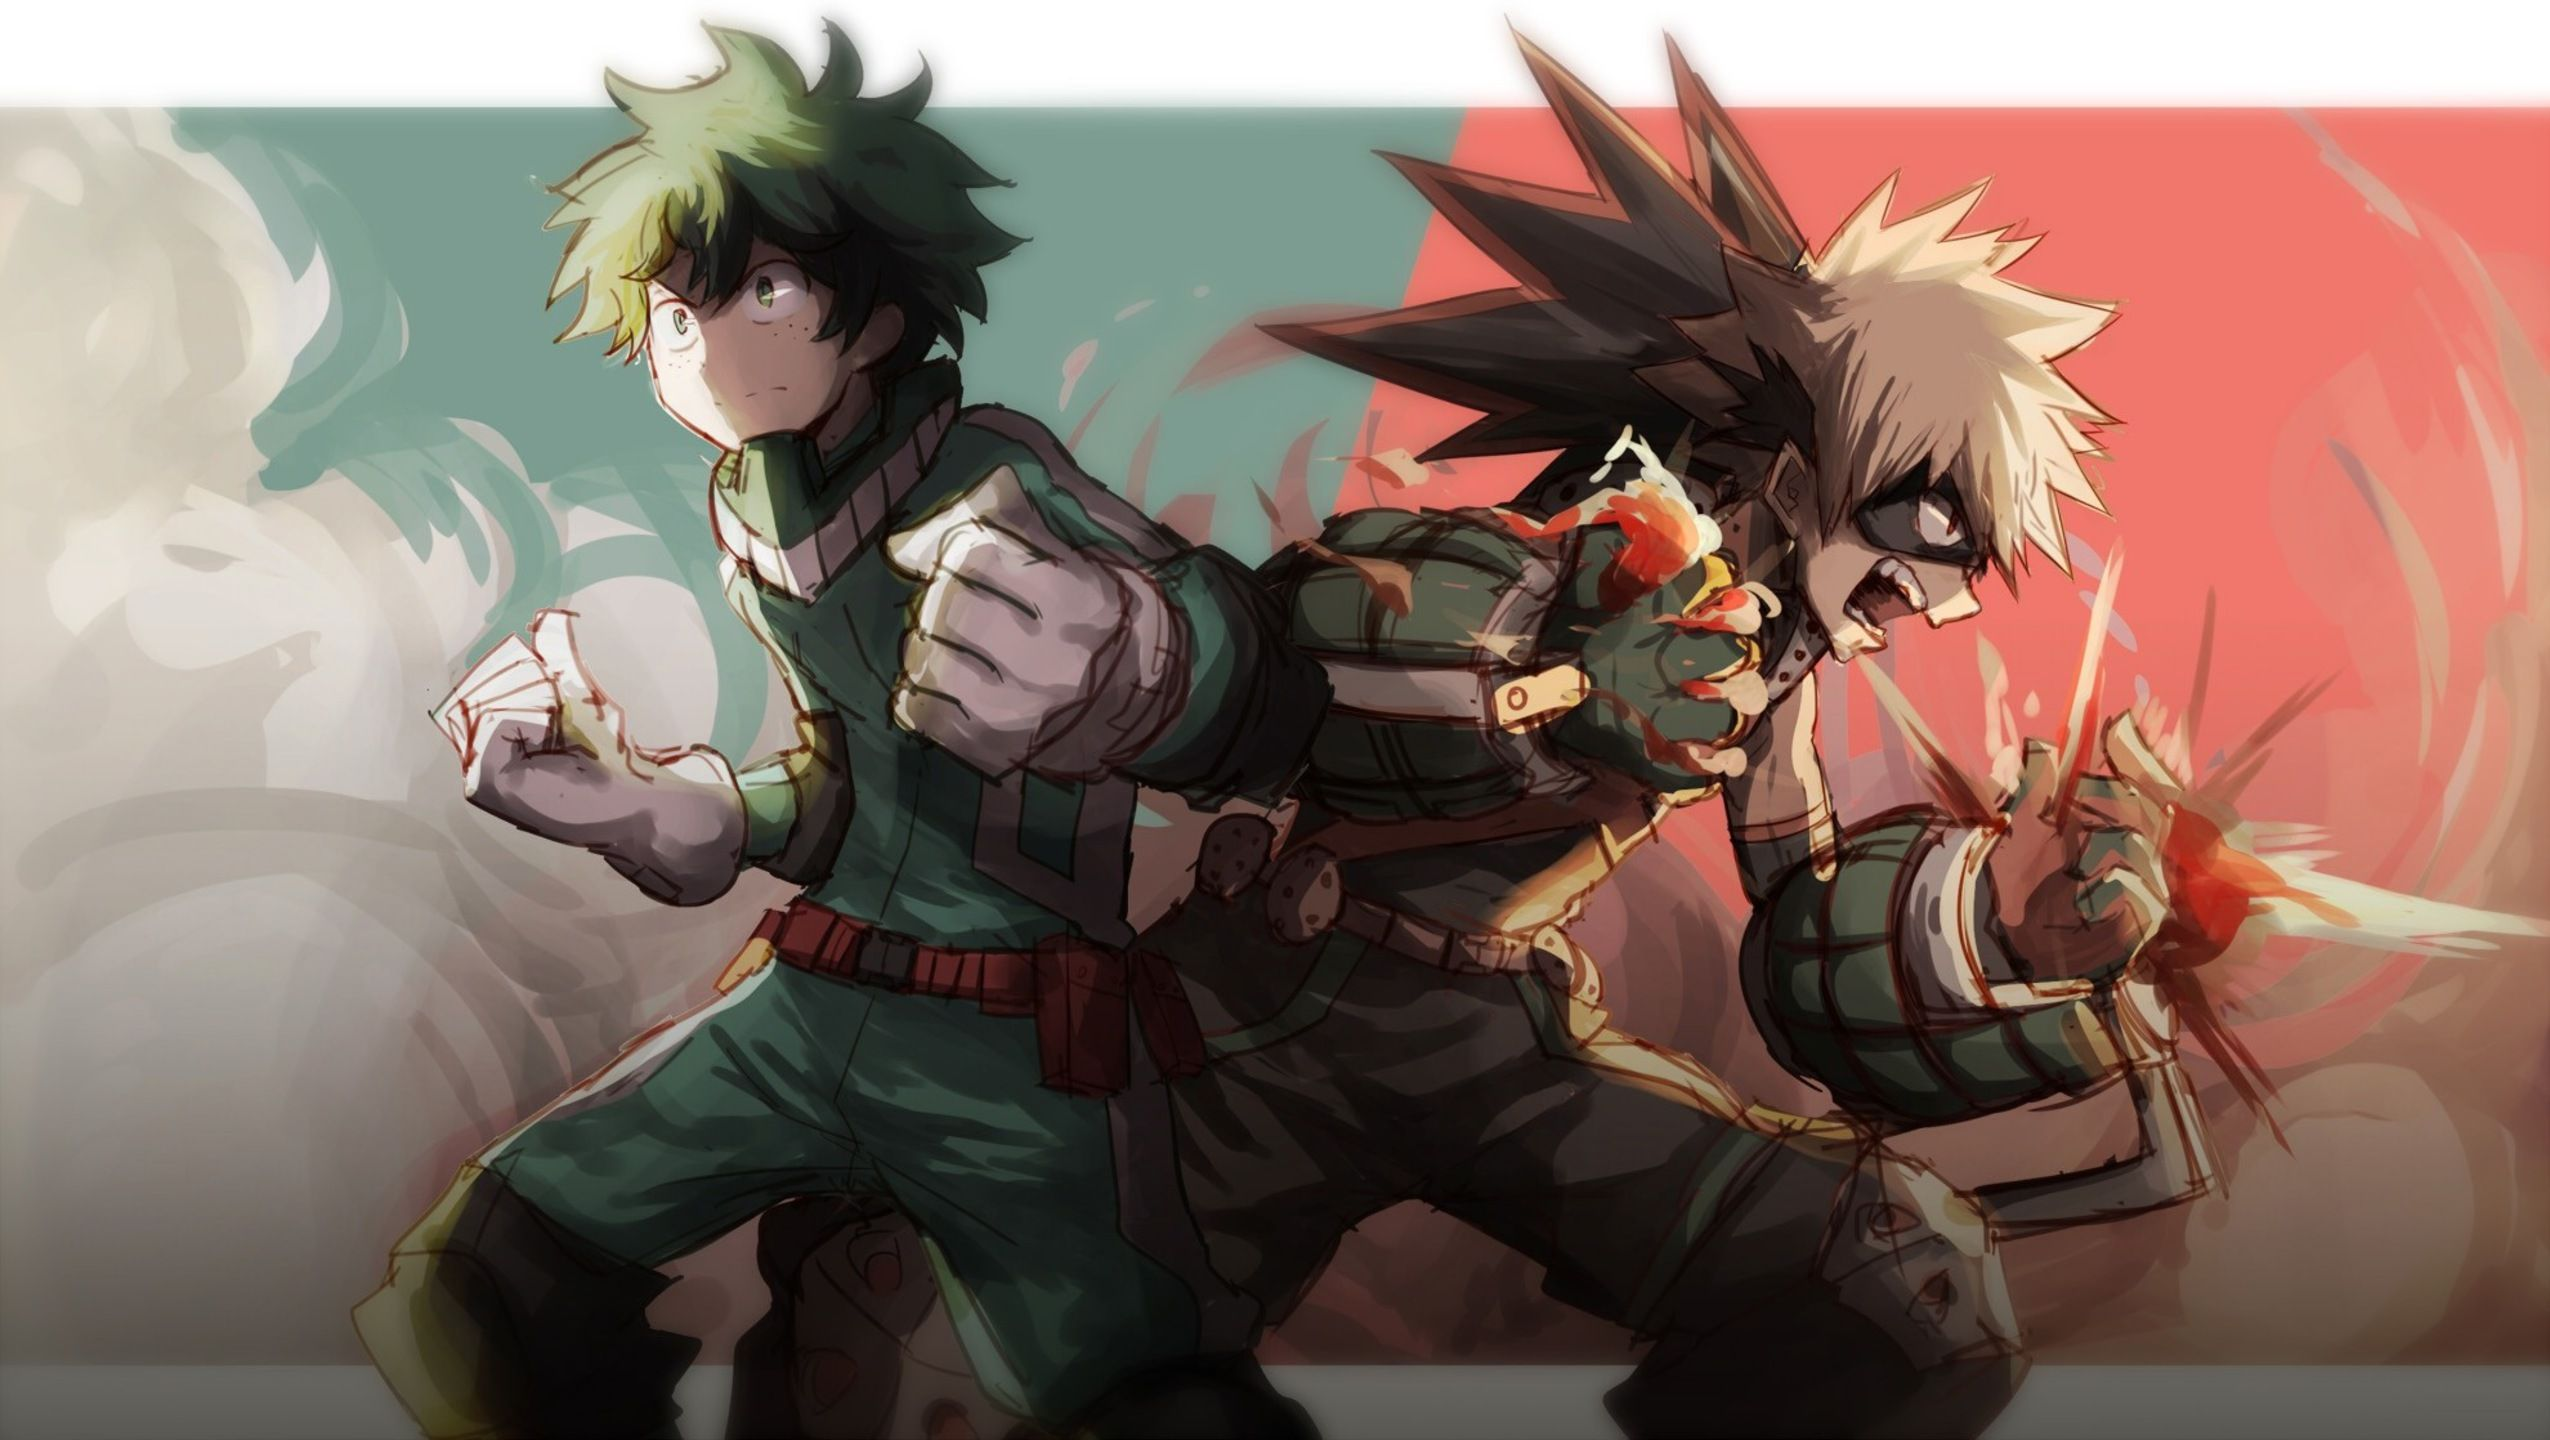 Boku No Hero Academia Hd Wallpapers New Tab Install Boku No Hero Academia New Tab And Get Hd Wallpapers Of Dek My Hero My Hero Academia Boku No Hero Academia